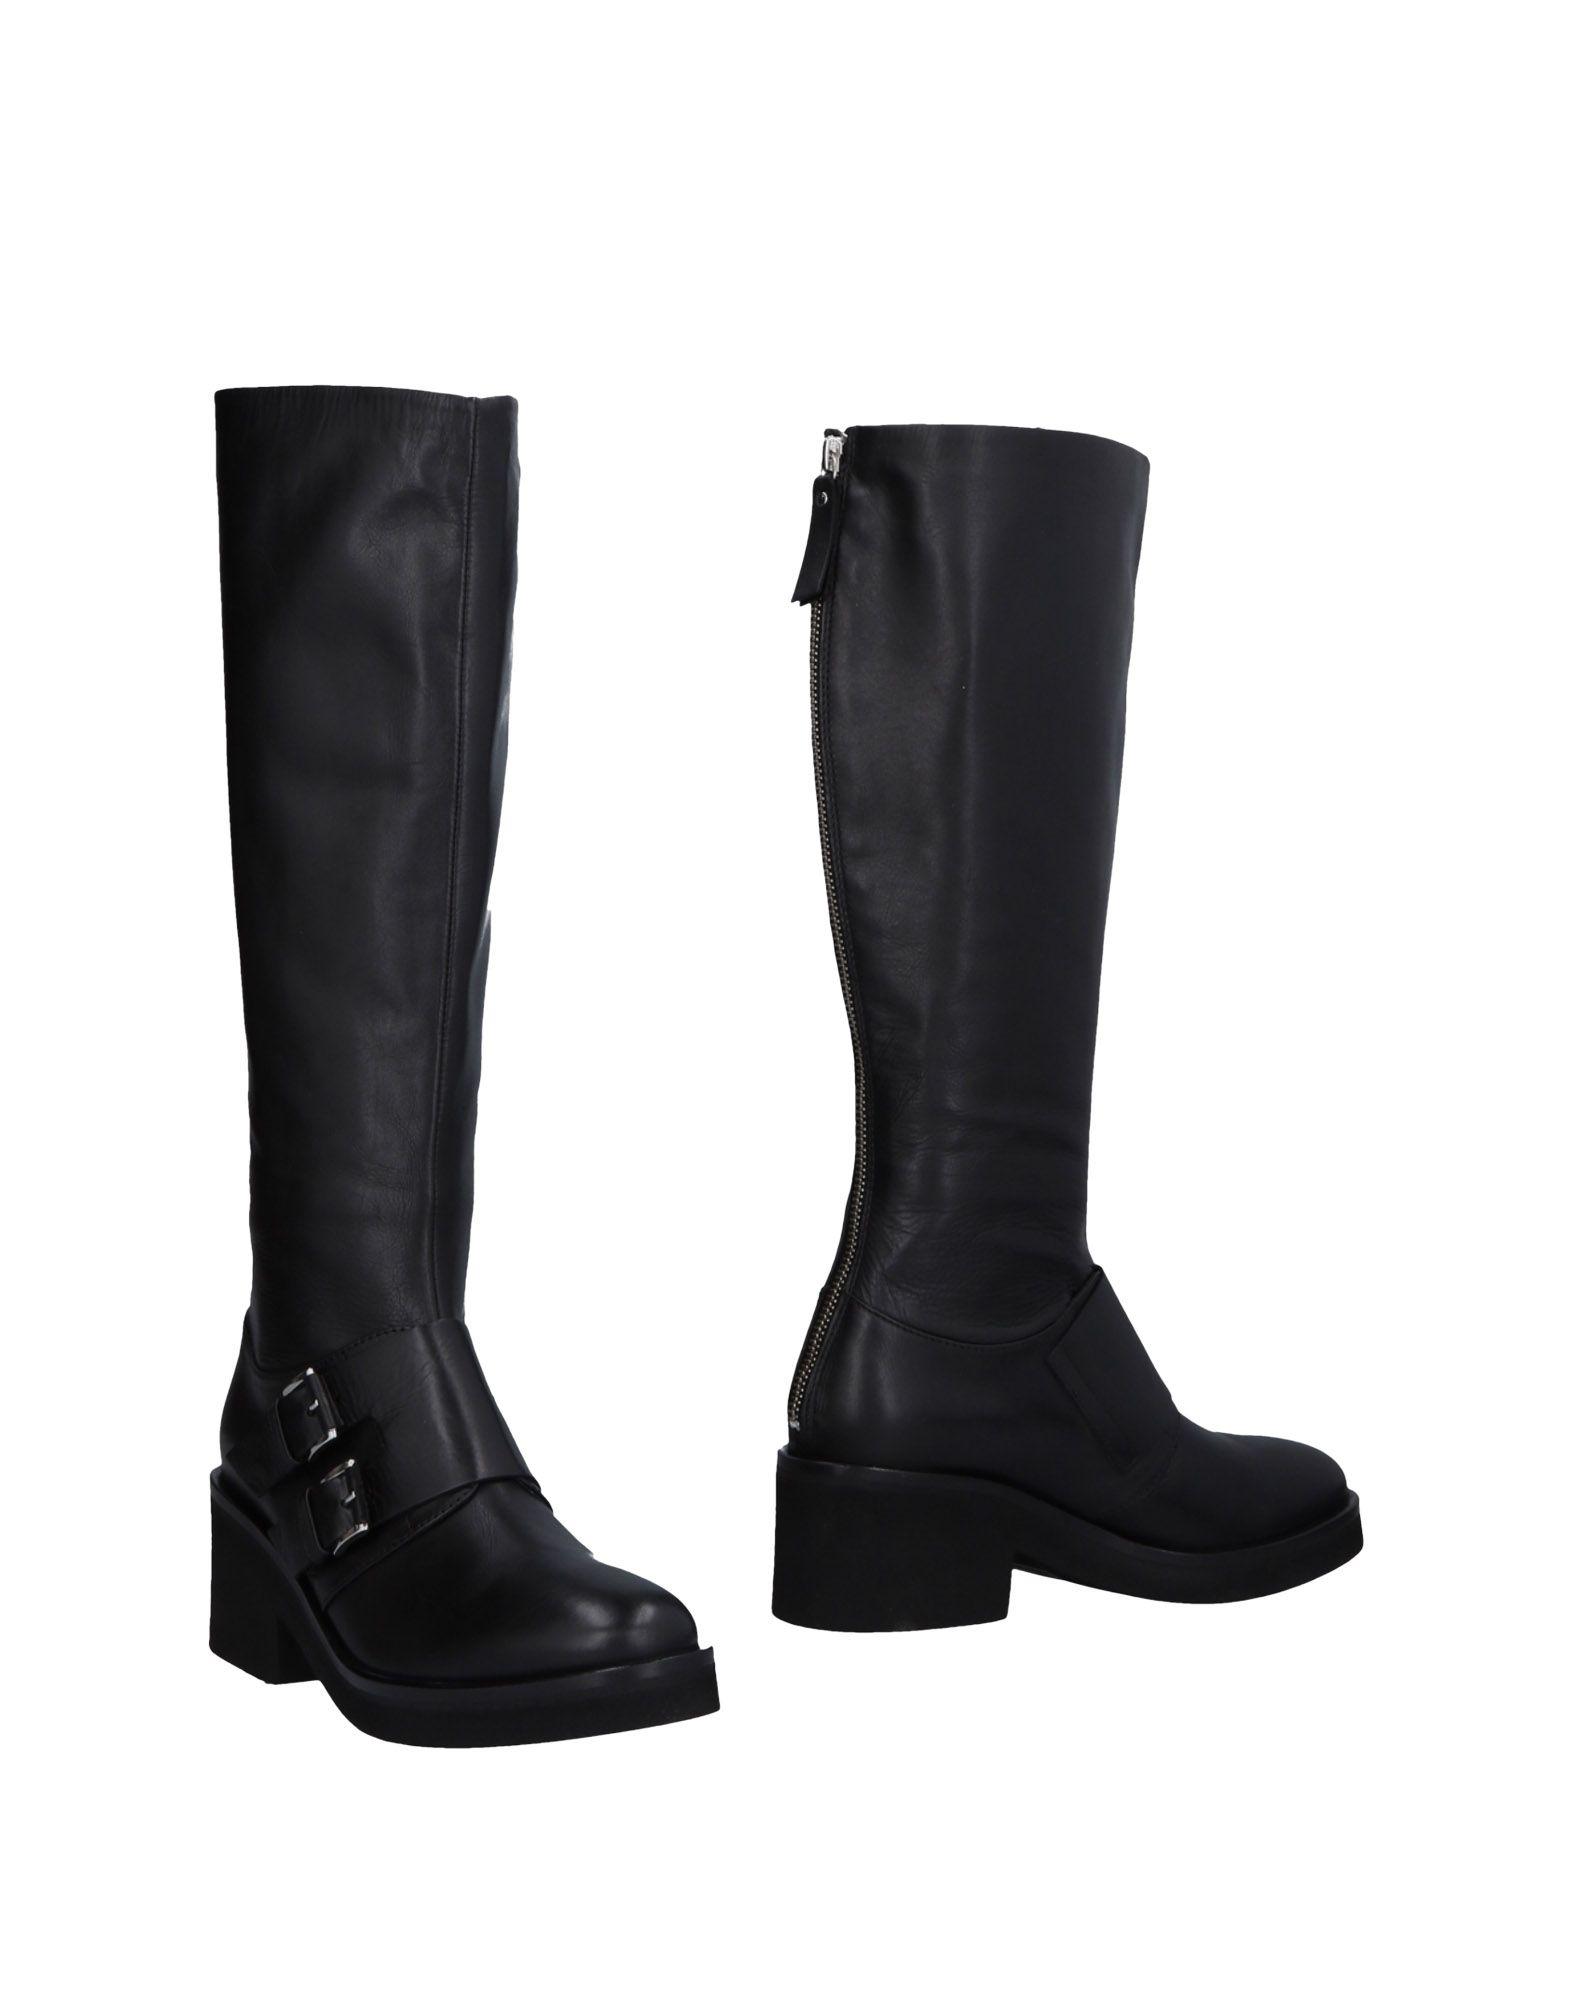 Vic Matiē Stiefel Damen  11473701BAGut aussehende strapazierfähige Schuhe